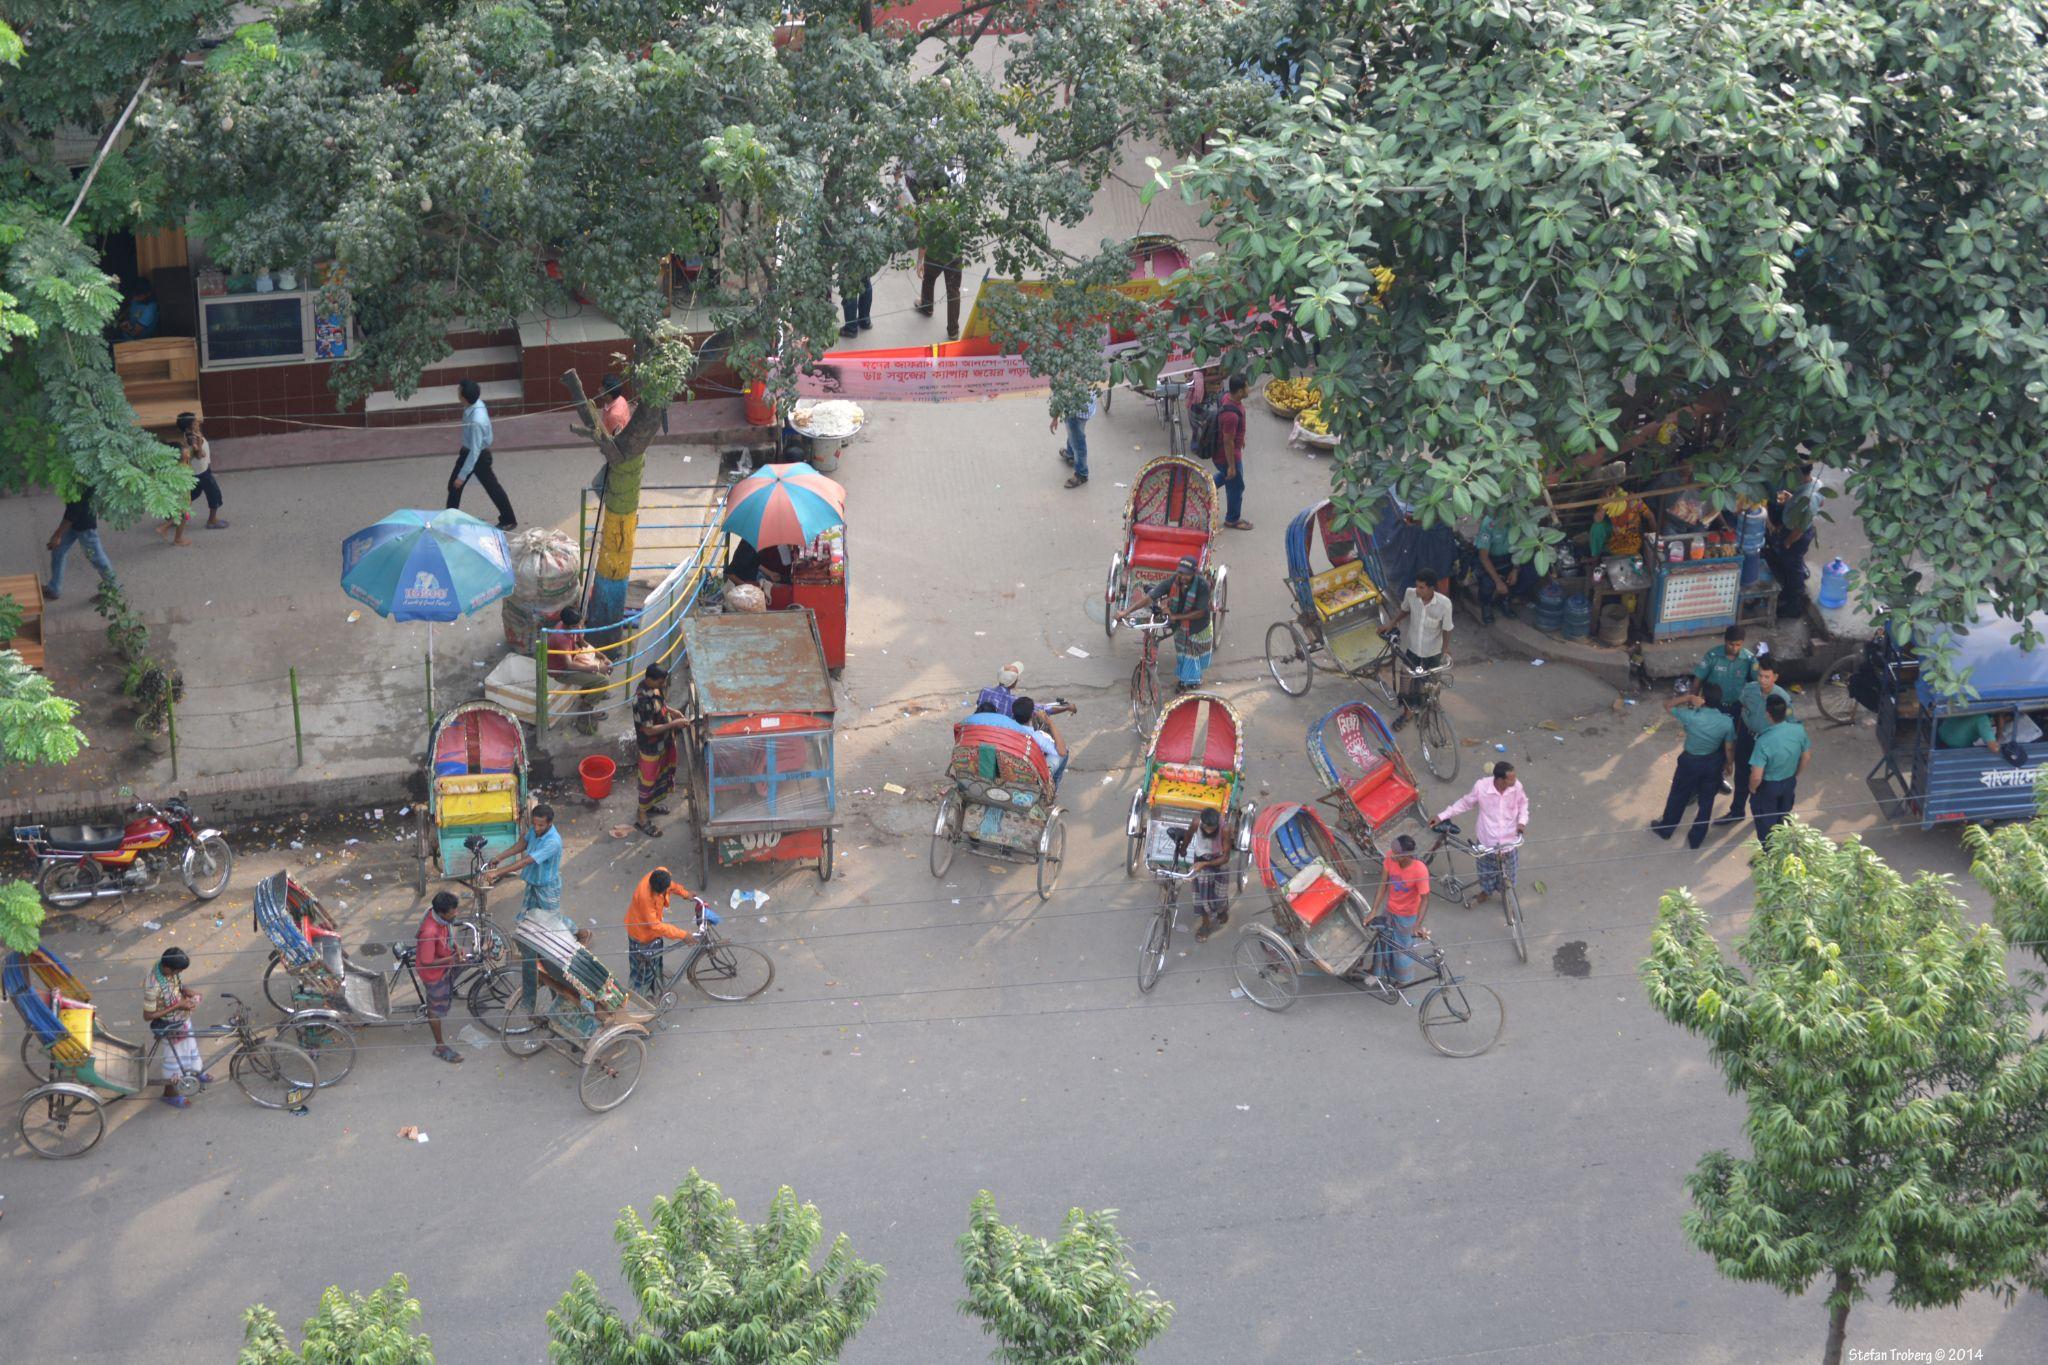 Rickshaw waiting for costumers by Stefan Troberg